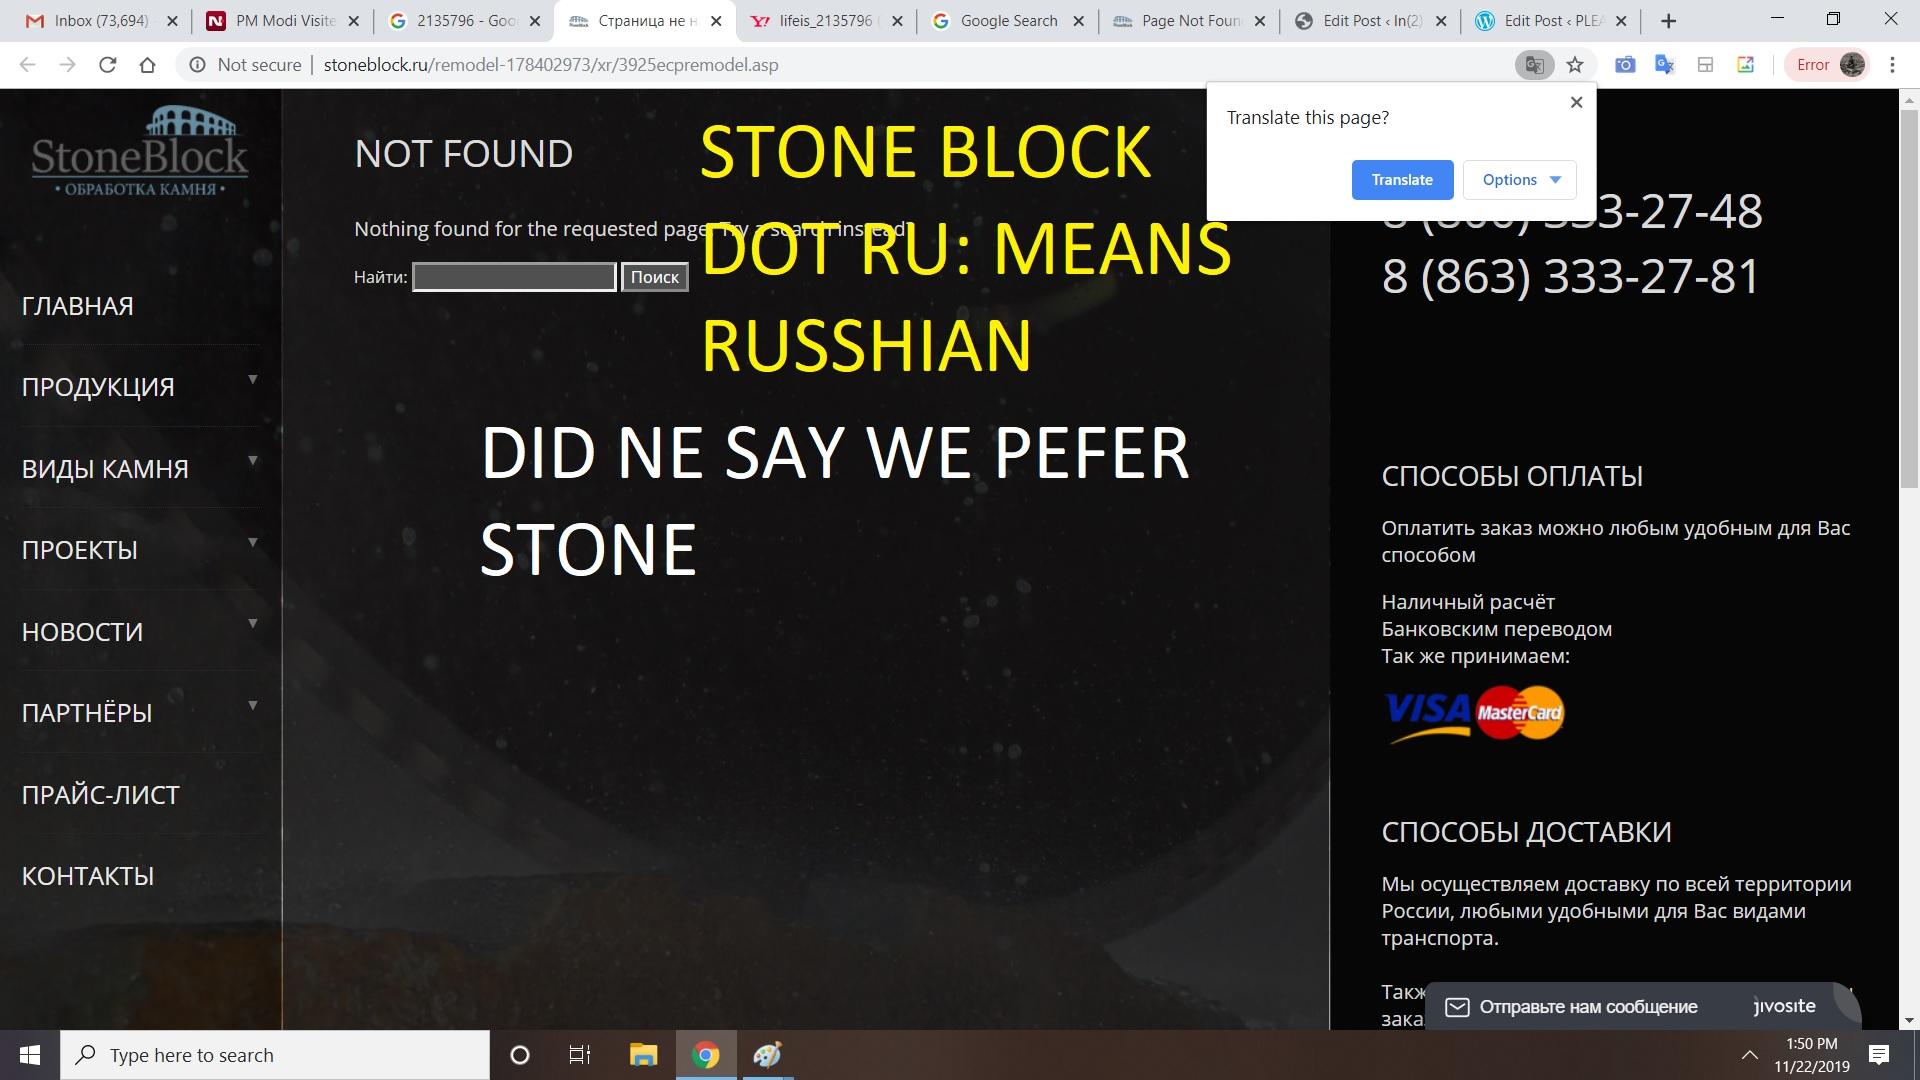 THE STONE BLOCK